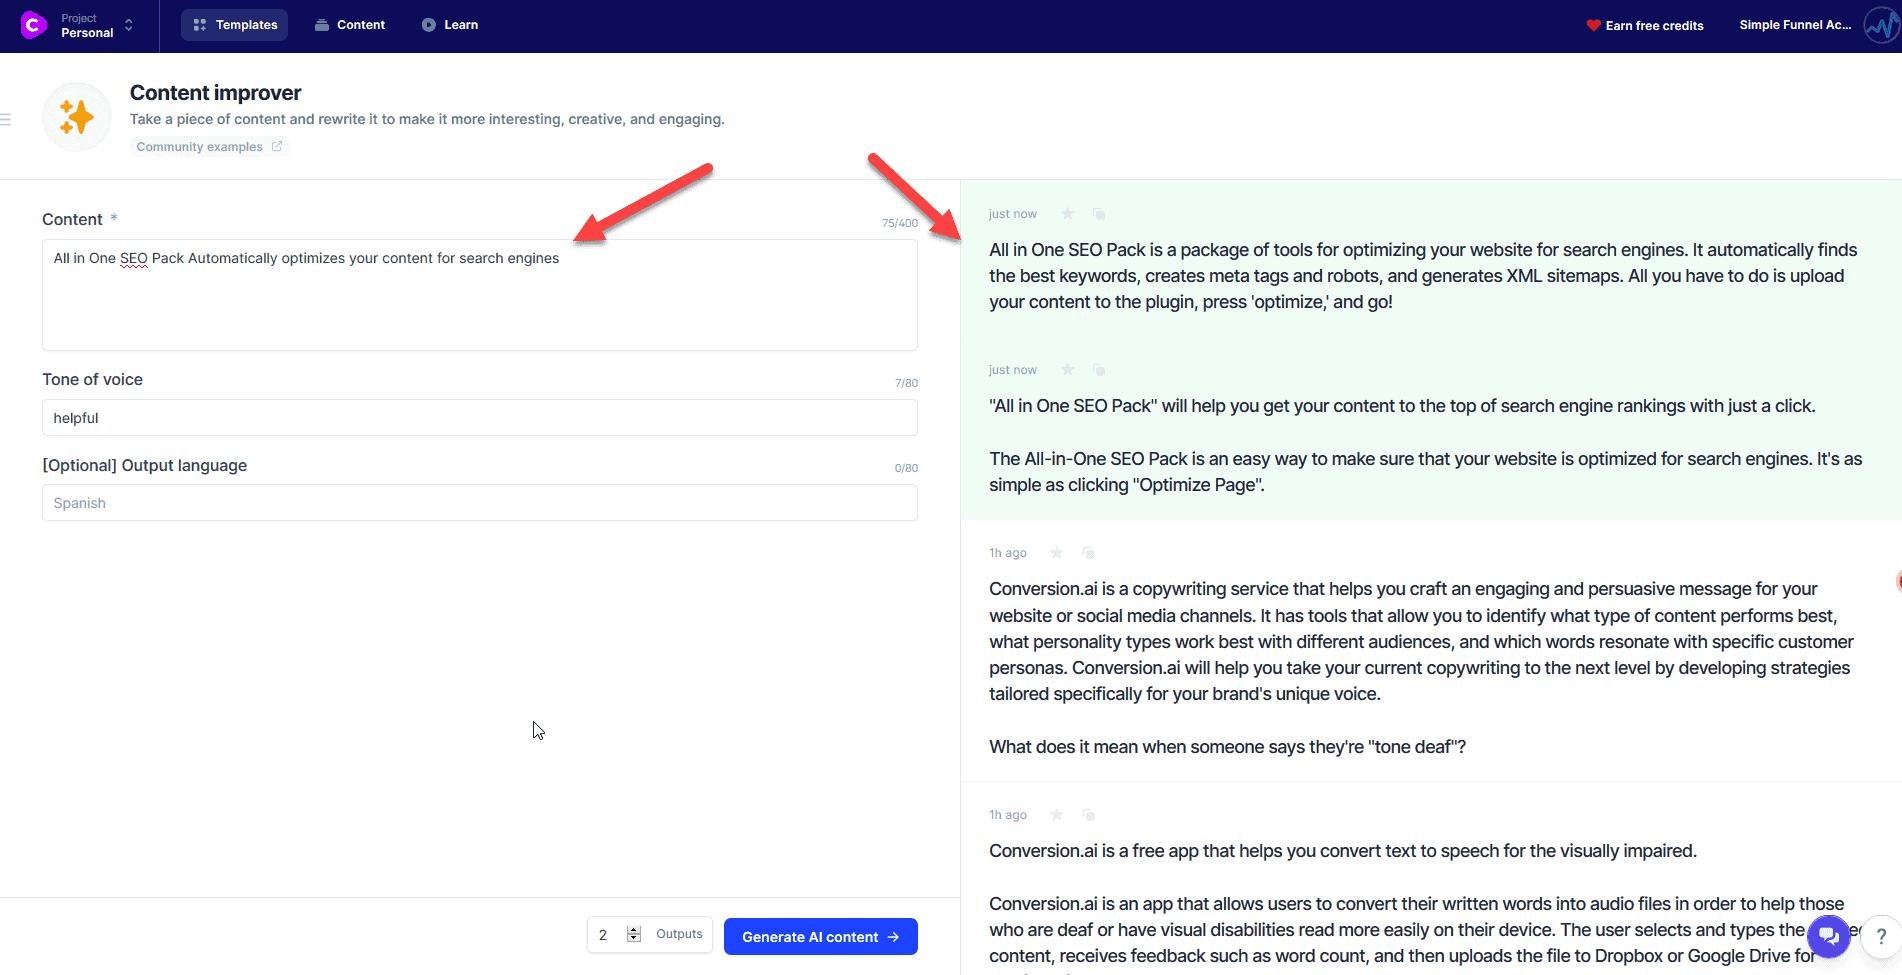 Conversion.ai Content Improver